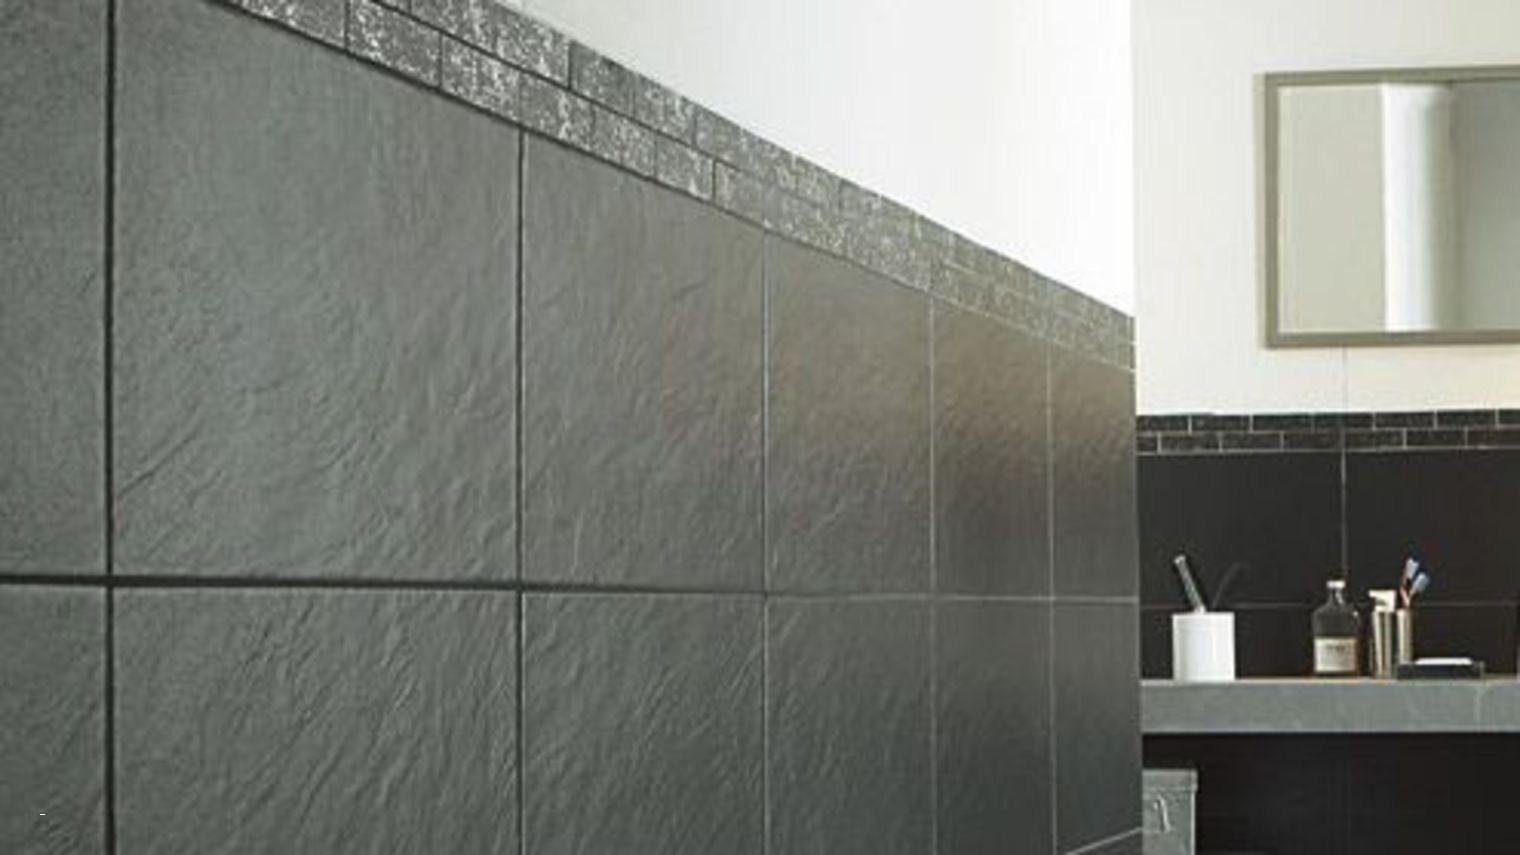 Carrelage Mosaique Castorama Beau Galerie Carrelage Frise Salle De Bain Brillant Baignoire Salle De Bain